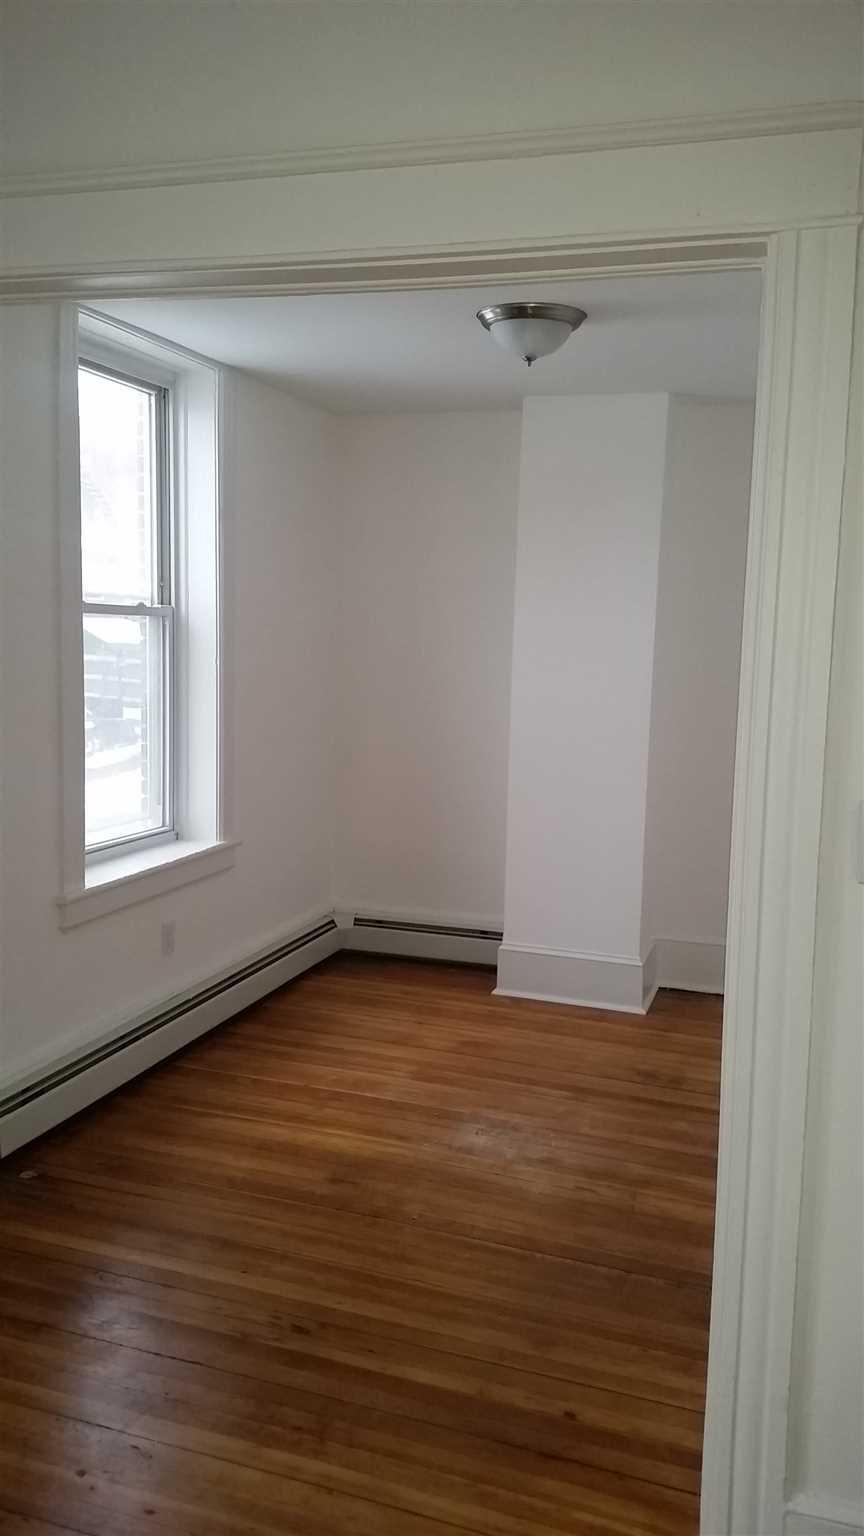 Single Family Home for Rent at 4 CLINTON Street 4 CLINTON Street Poughkeepsie, New York 12601 United States